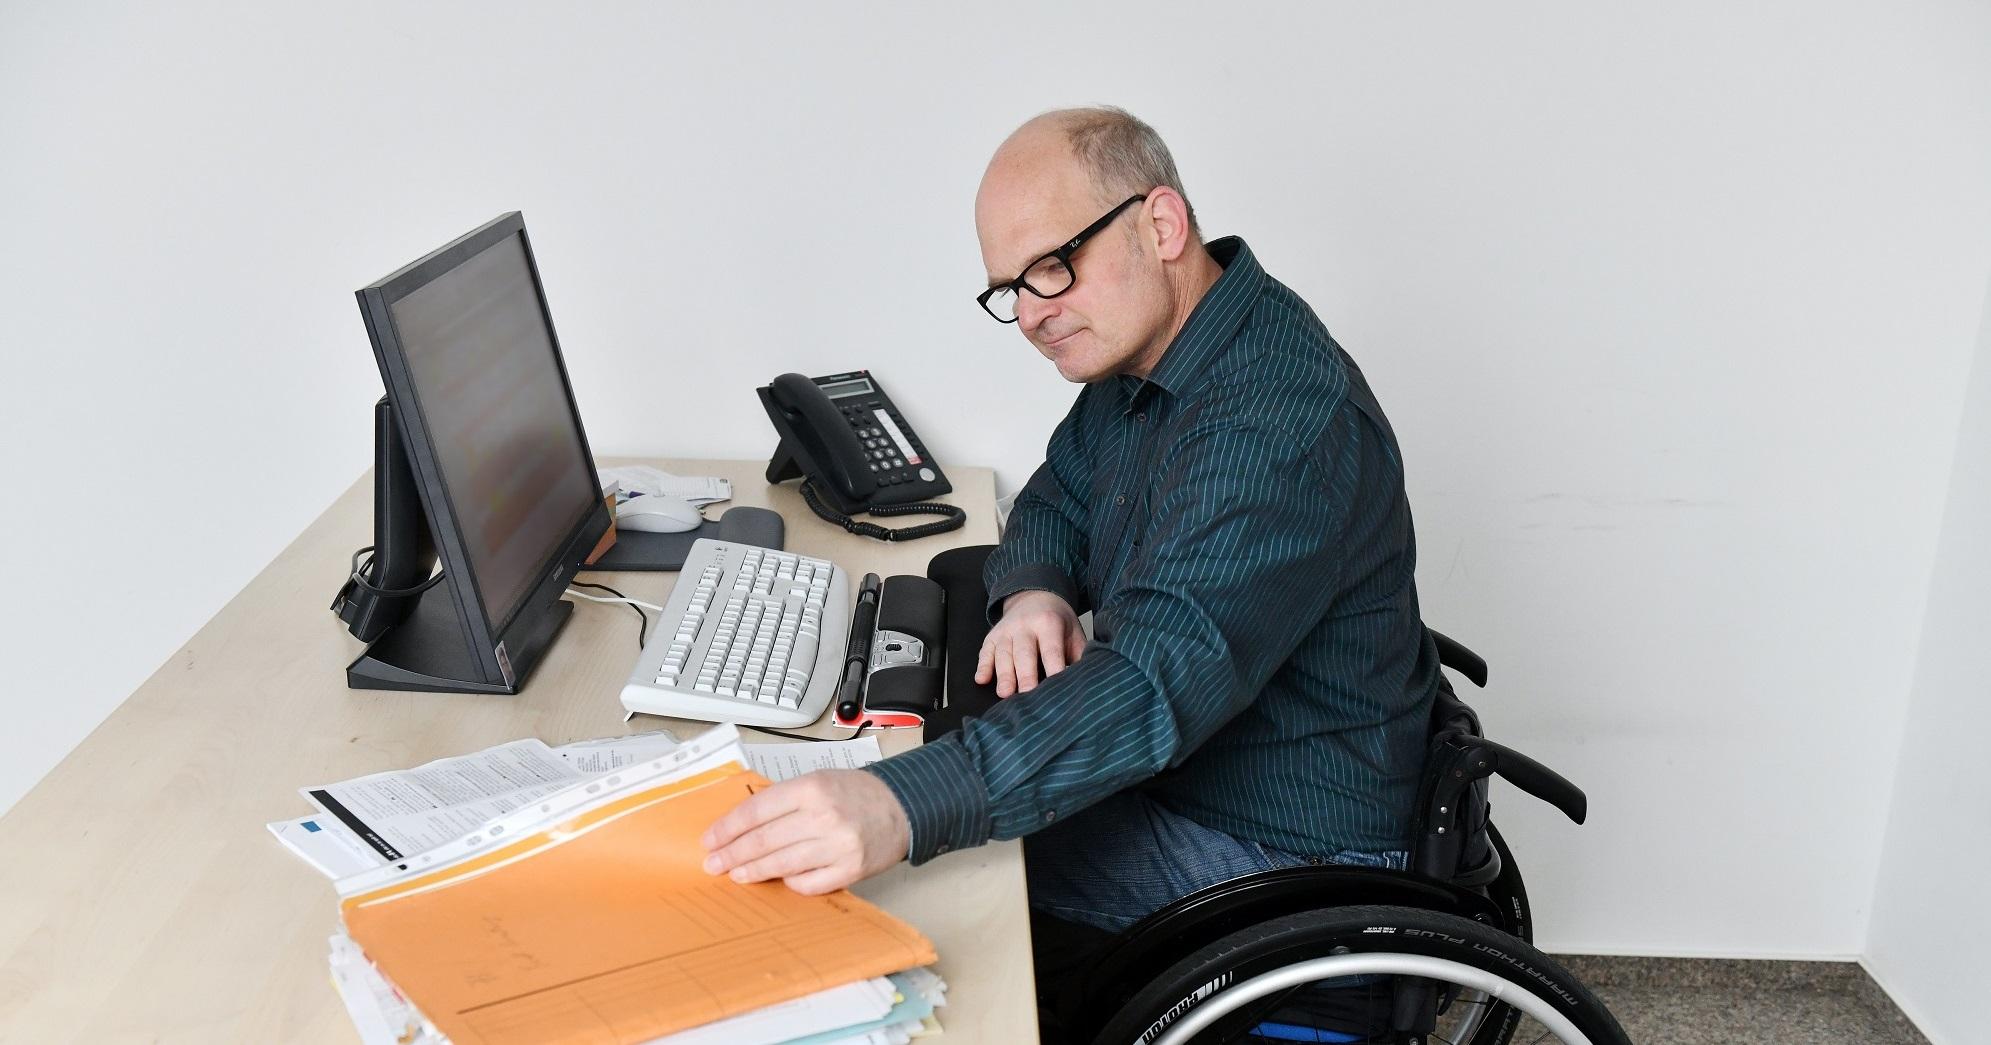 Workplace inclusivity